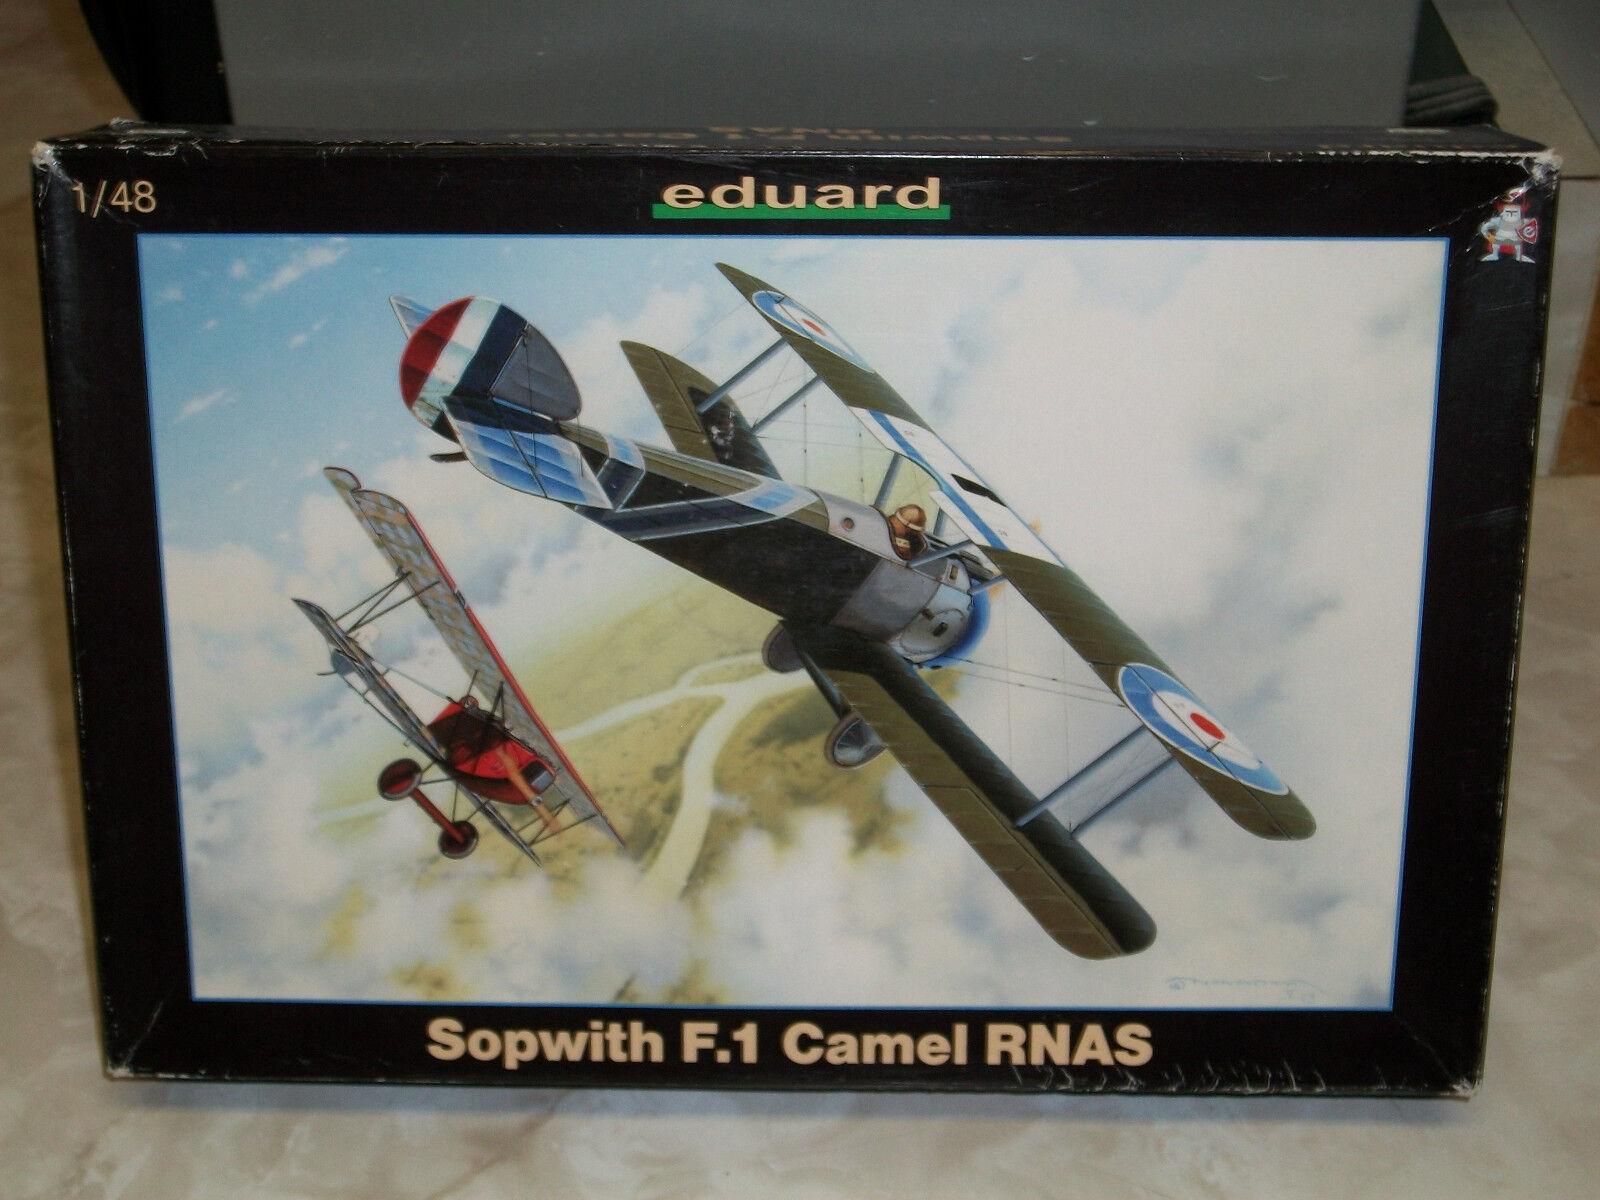 Eduard 1 48 Scale Sopwith F.1 Camel RNAS